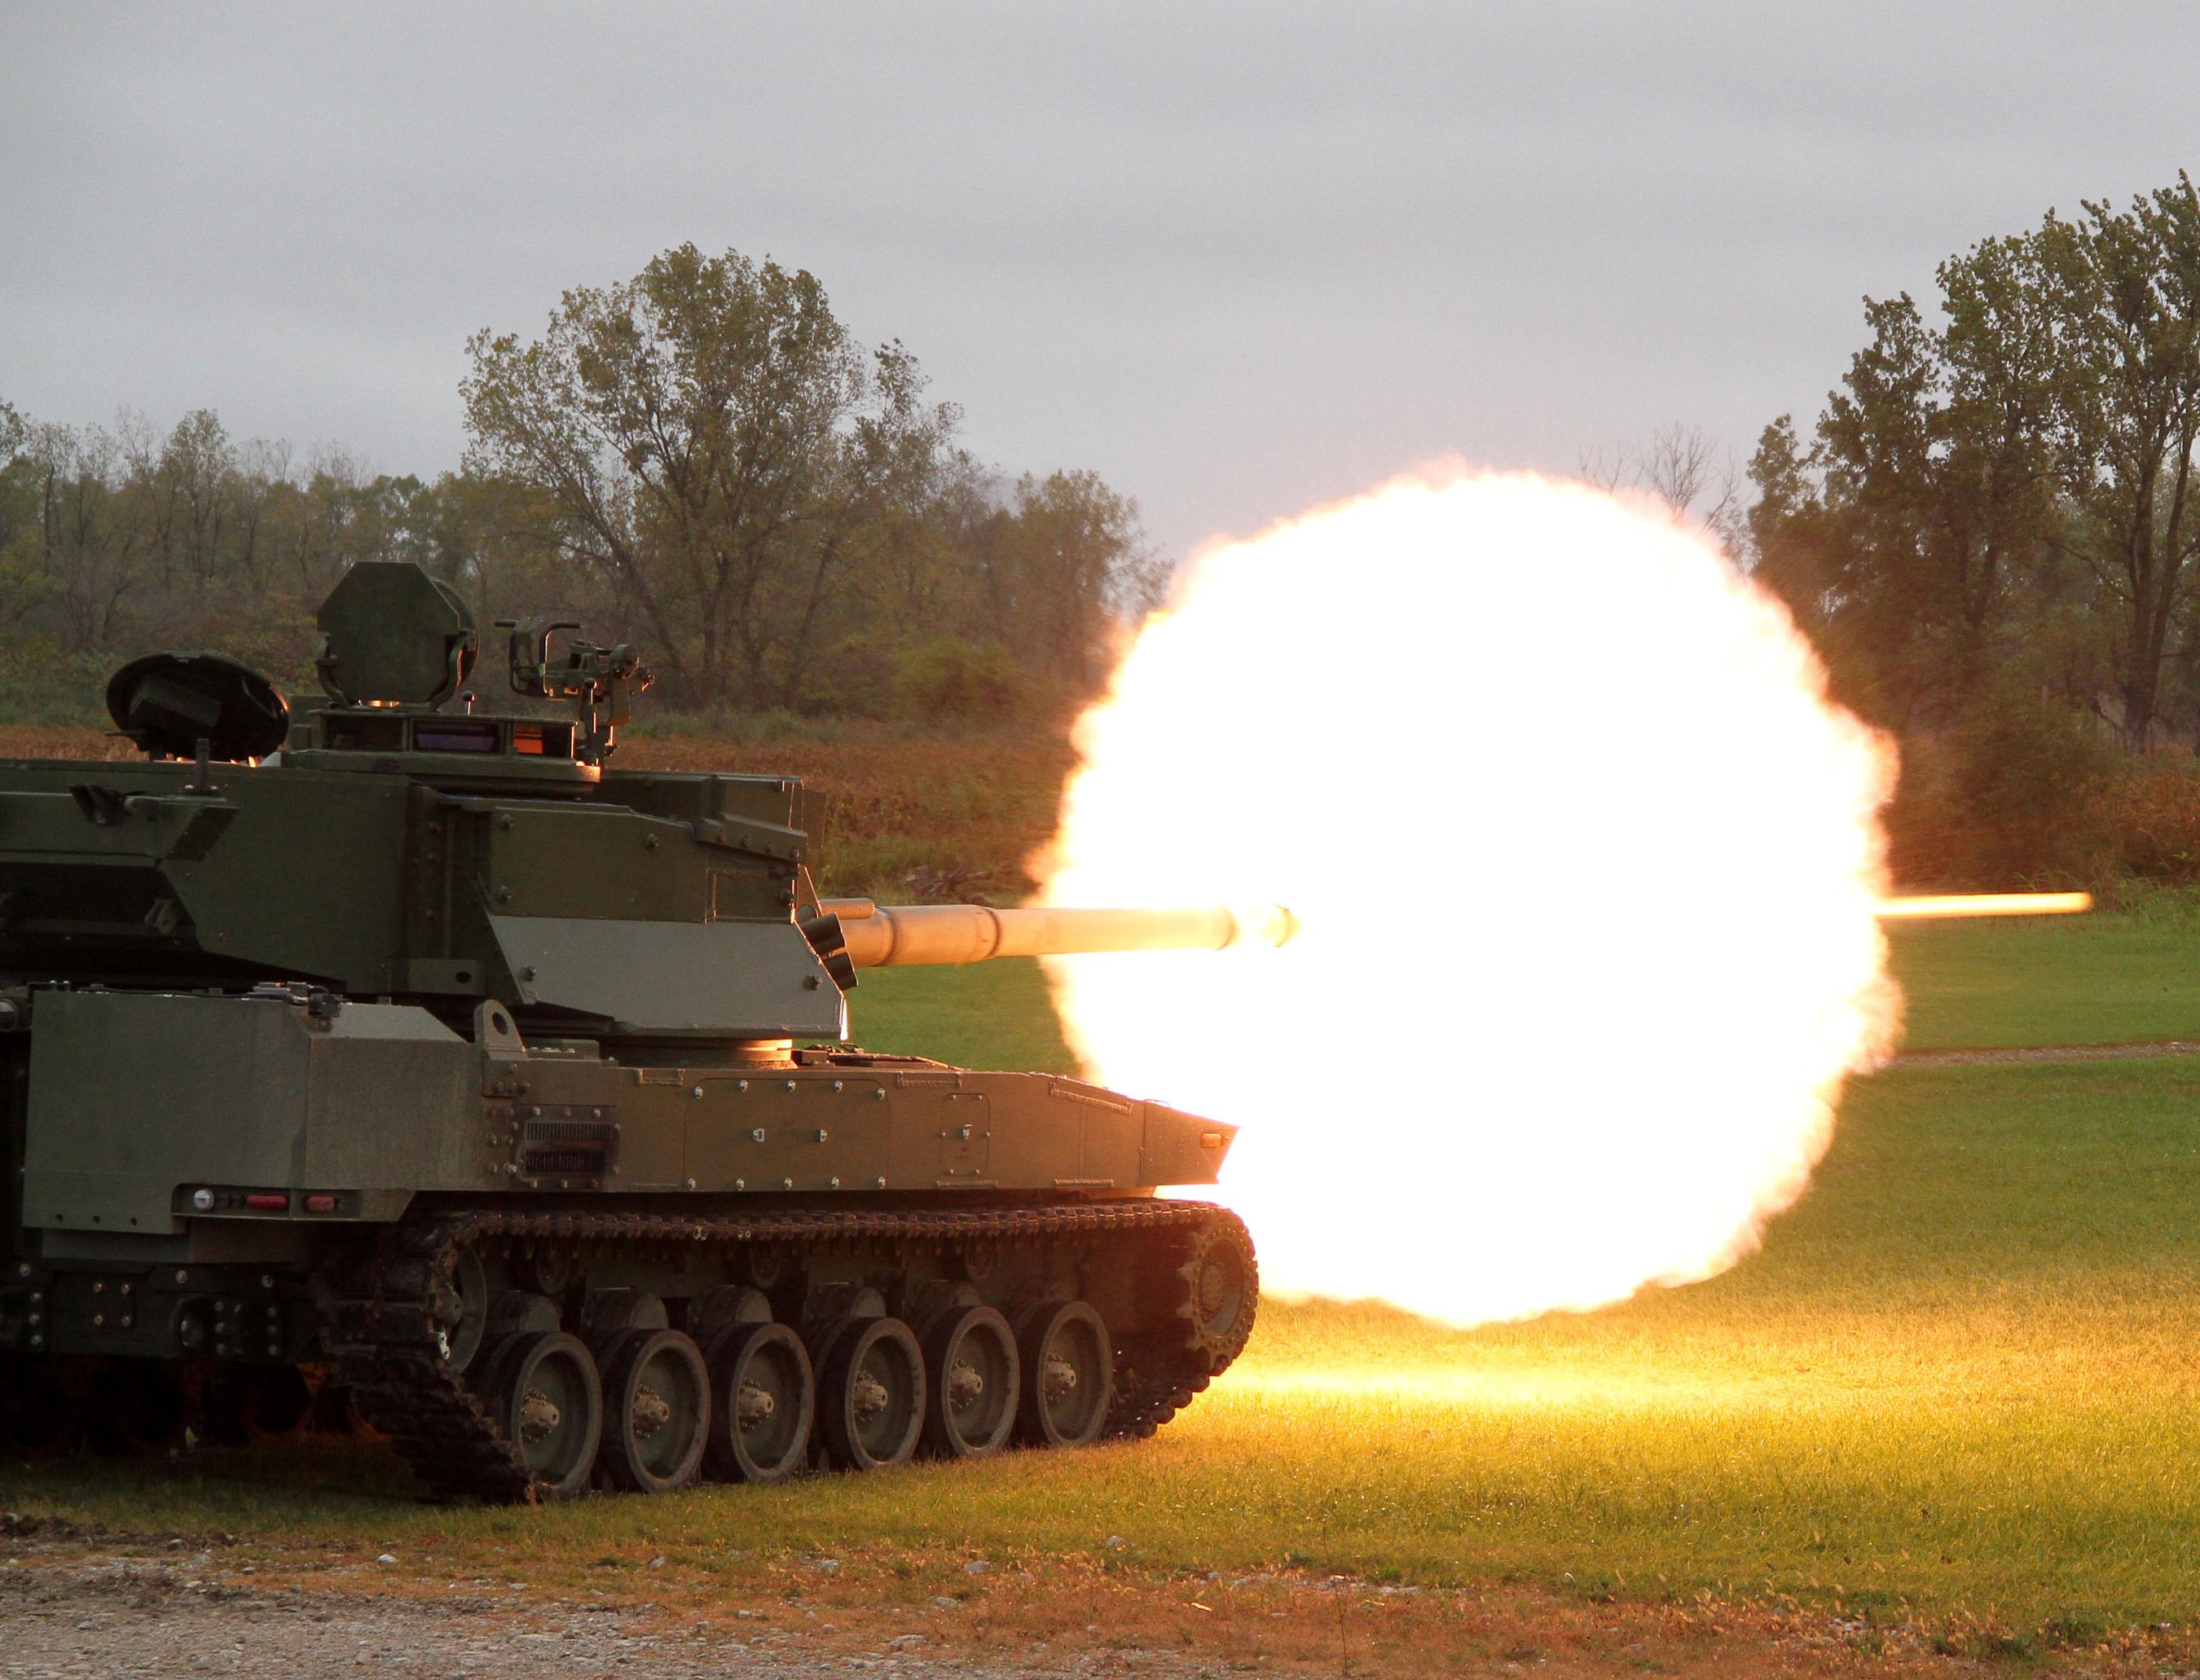 General Dynamics Griffin II light tank prototype.